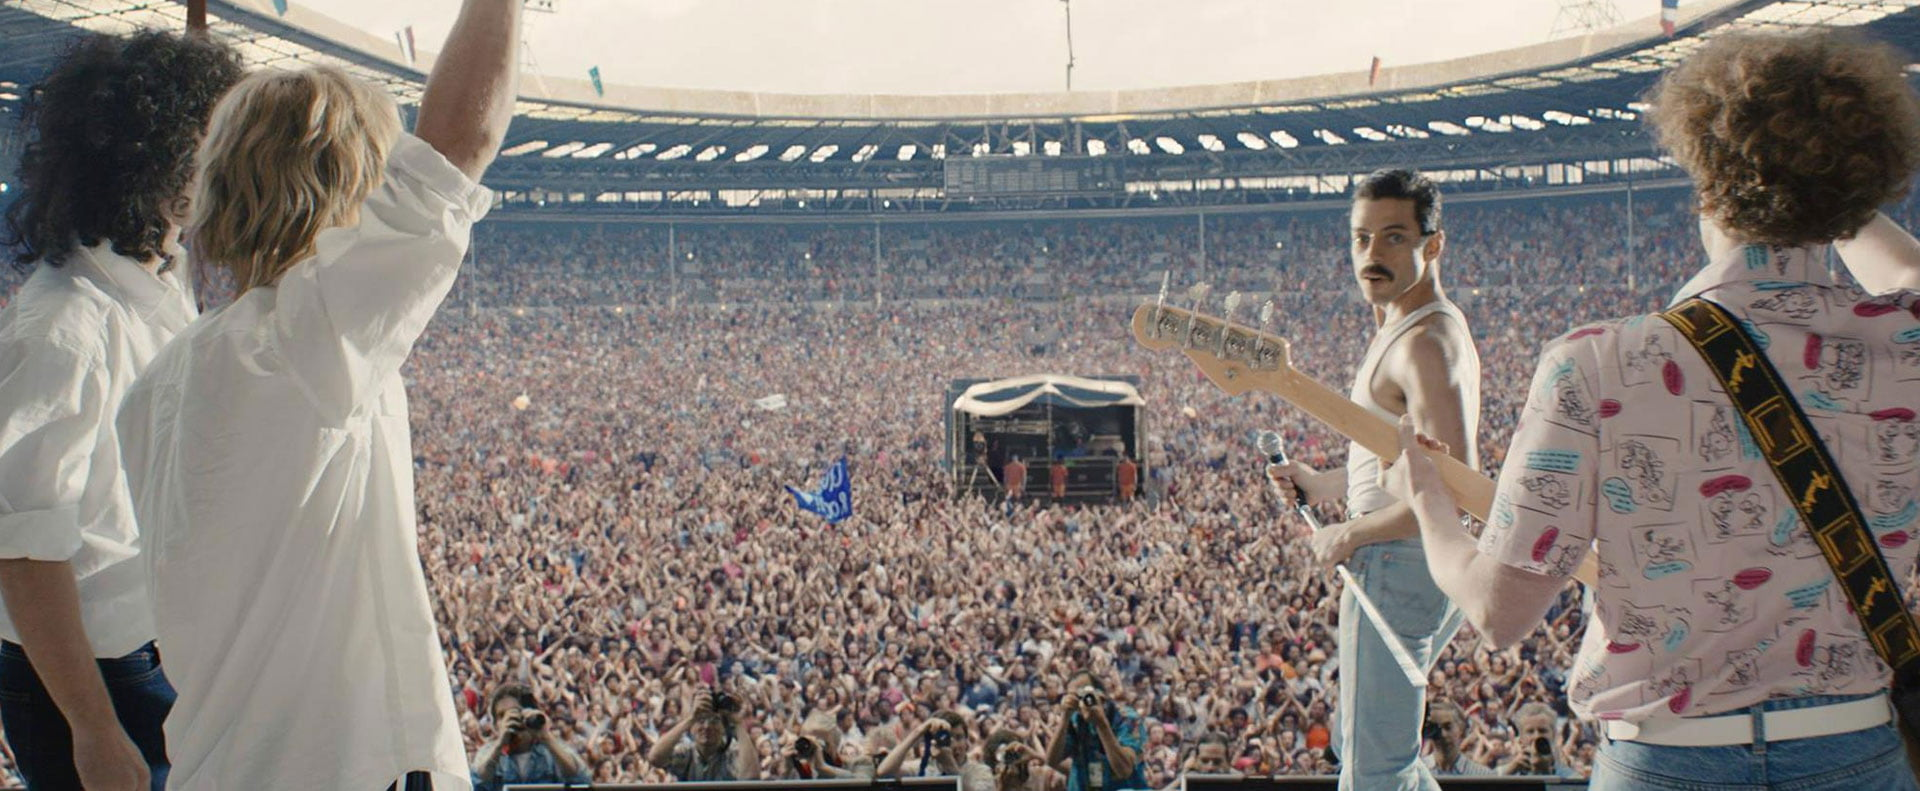 Богемна рапсодія / Bohemian Rhapsody (2018)